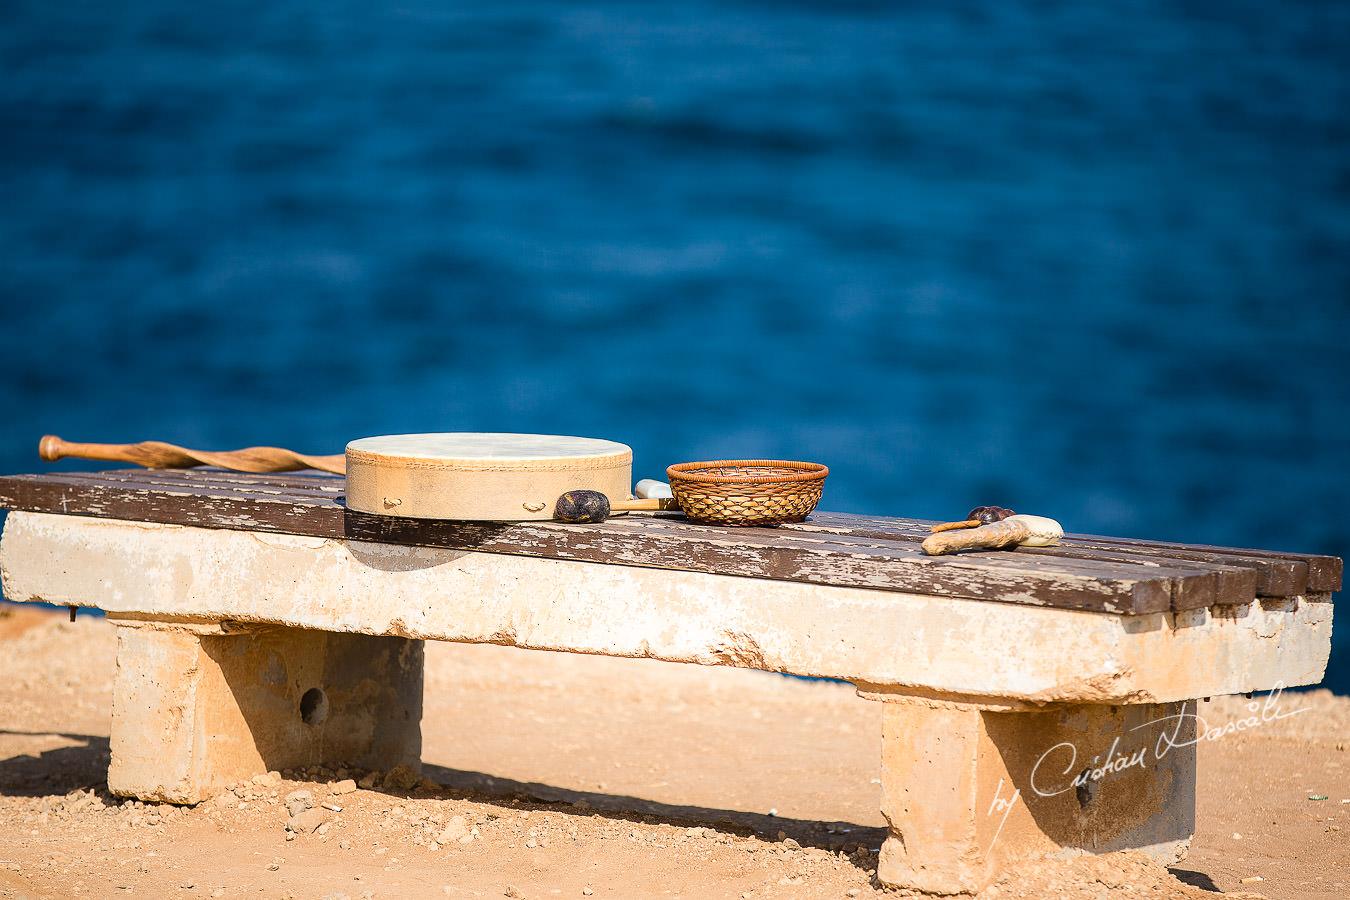 Shaman's tools captured at a Shamanic Wedding Ceremony by Cyprus Wedding Photographer Cristian Dascalu.